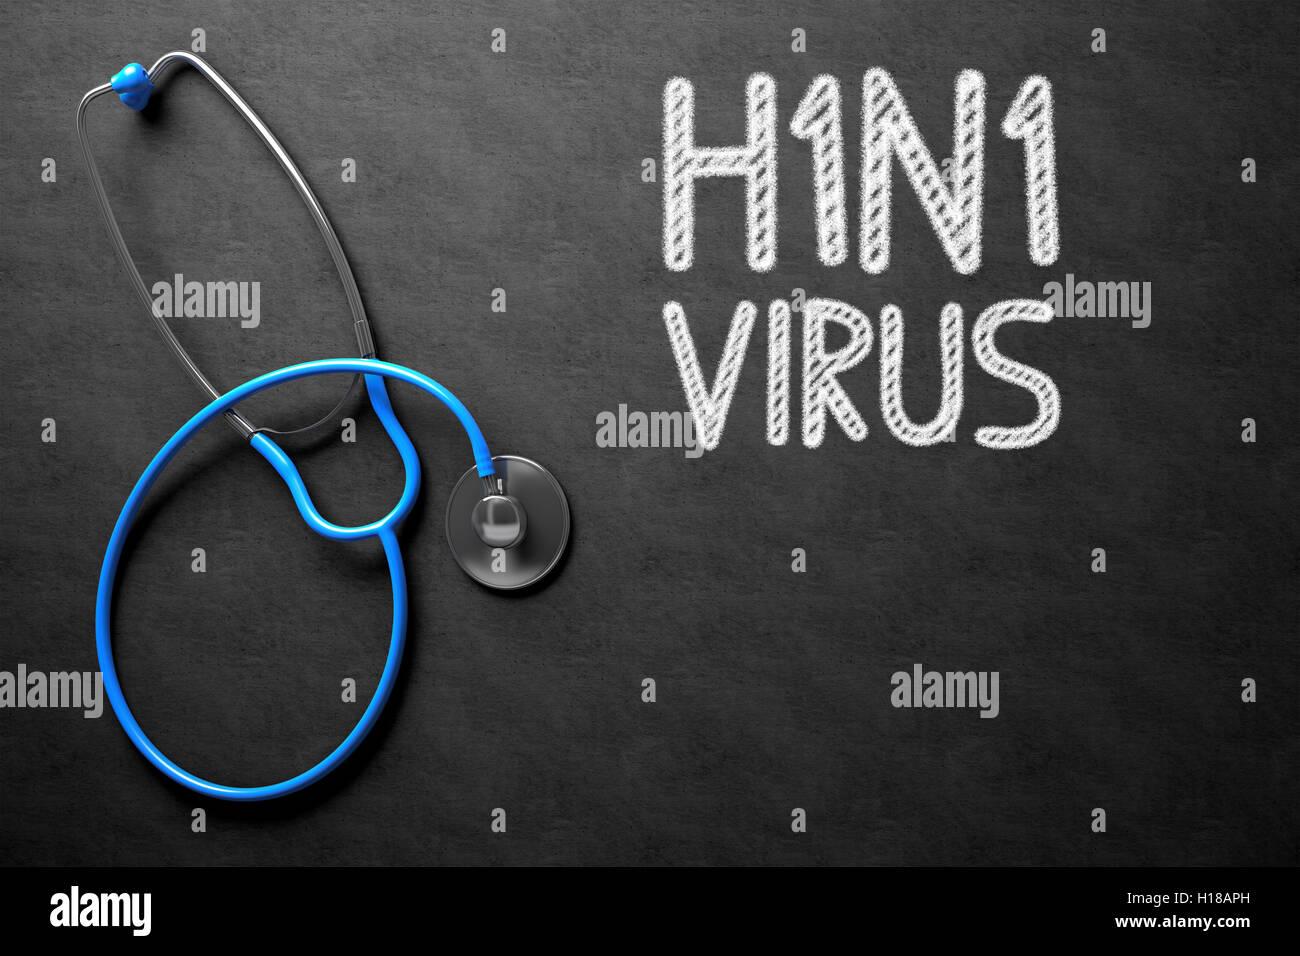 H1N1 - Text on Chalkboard. 3D Illustration. - Stock Image